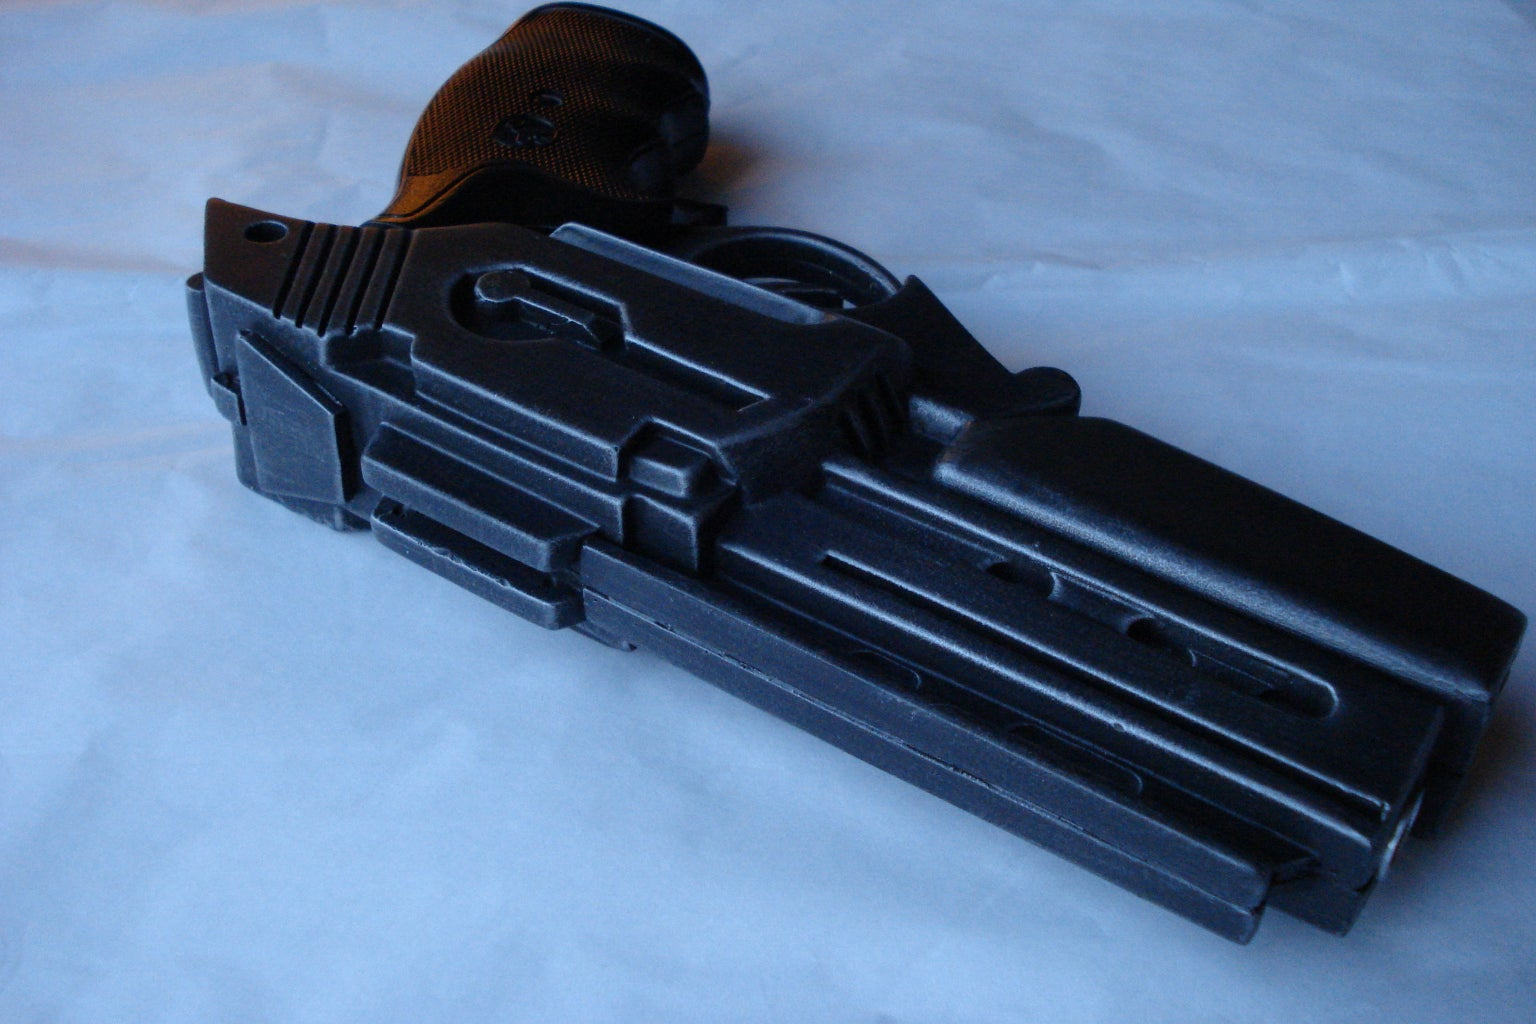 Battlestar Galactica Season 1 Sidearm Prop With Holster